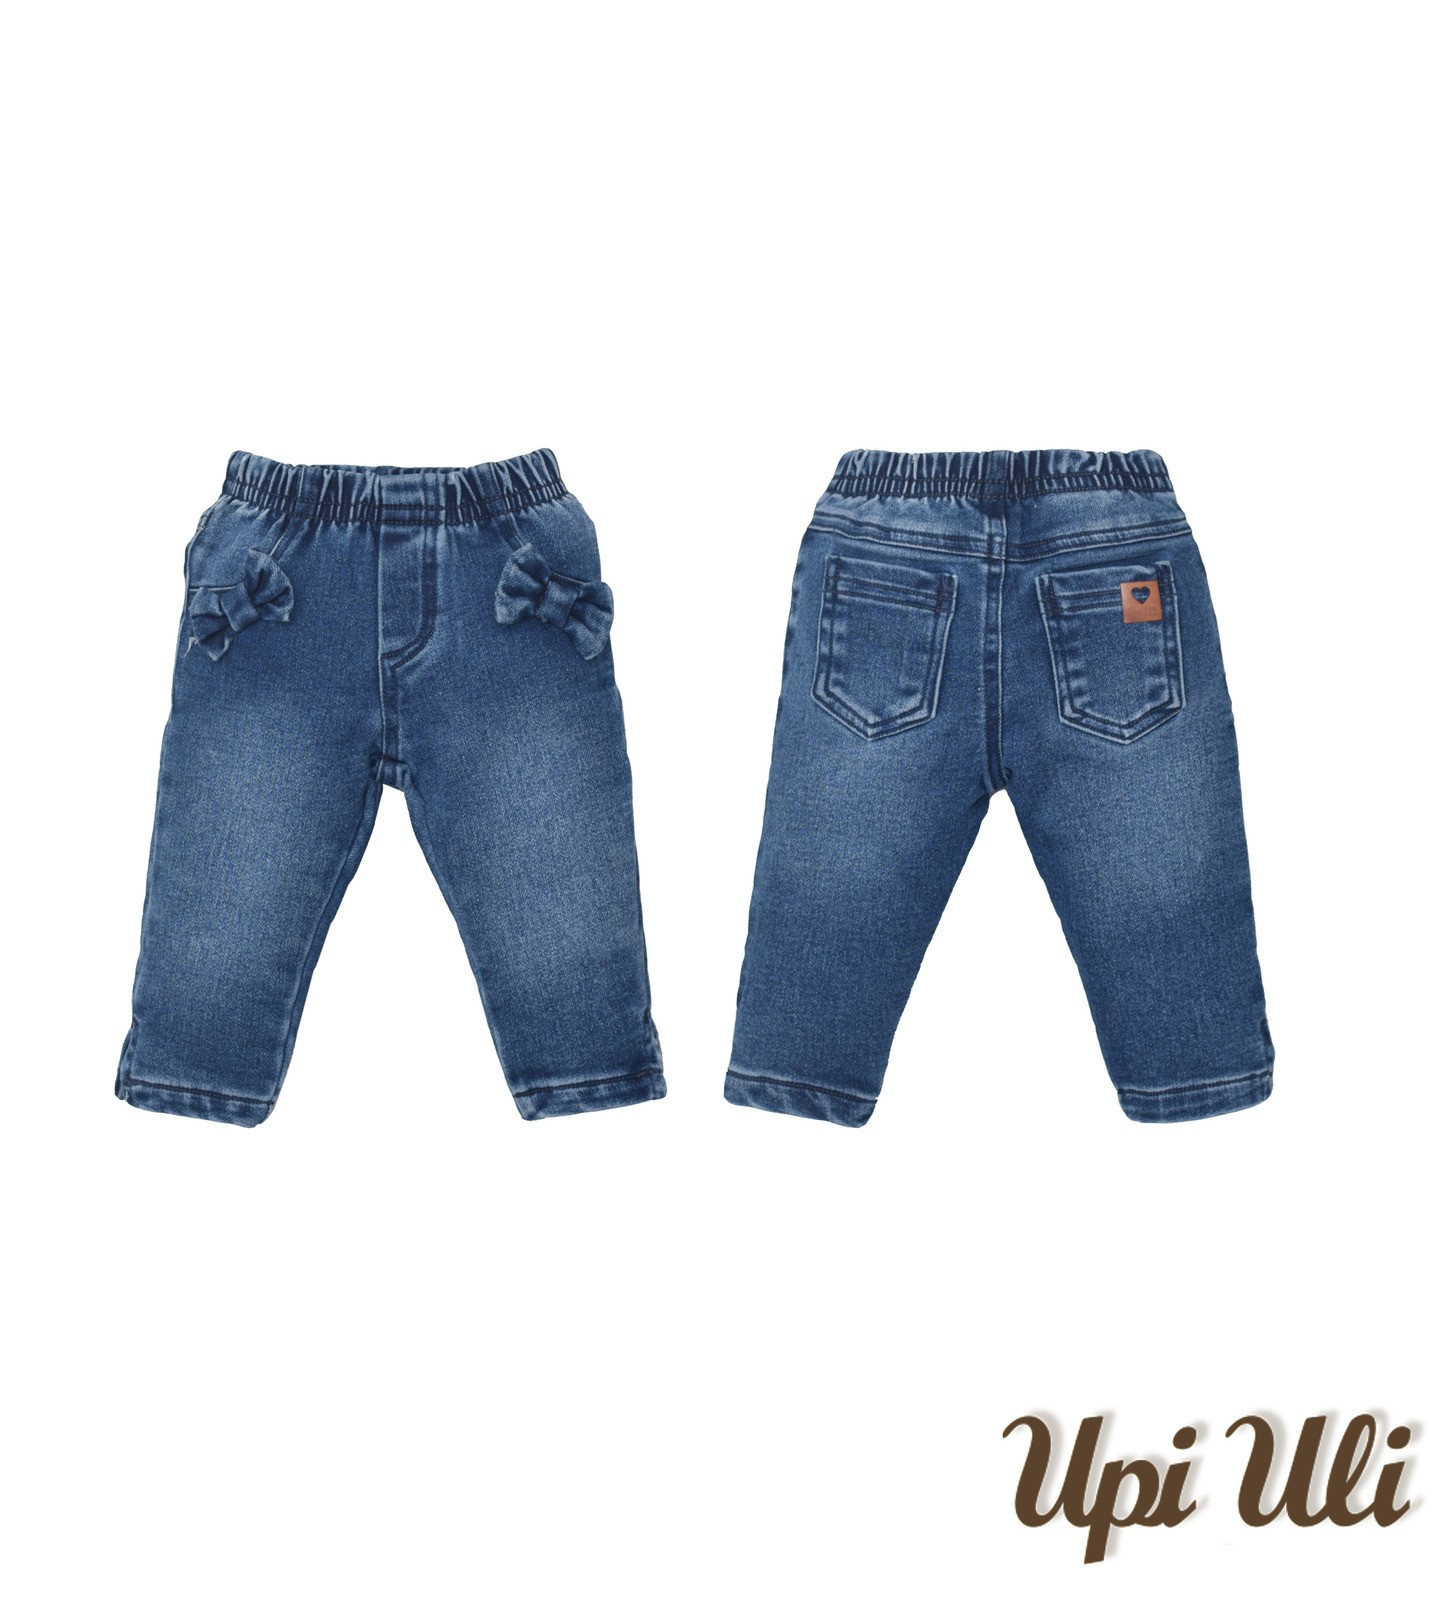 Calça Jeans Upiuli Girl